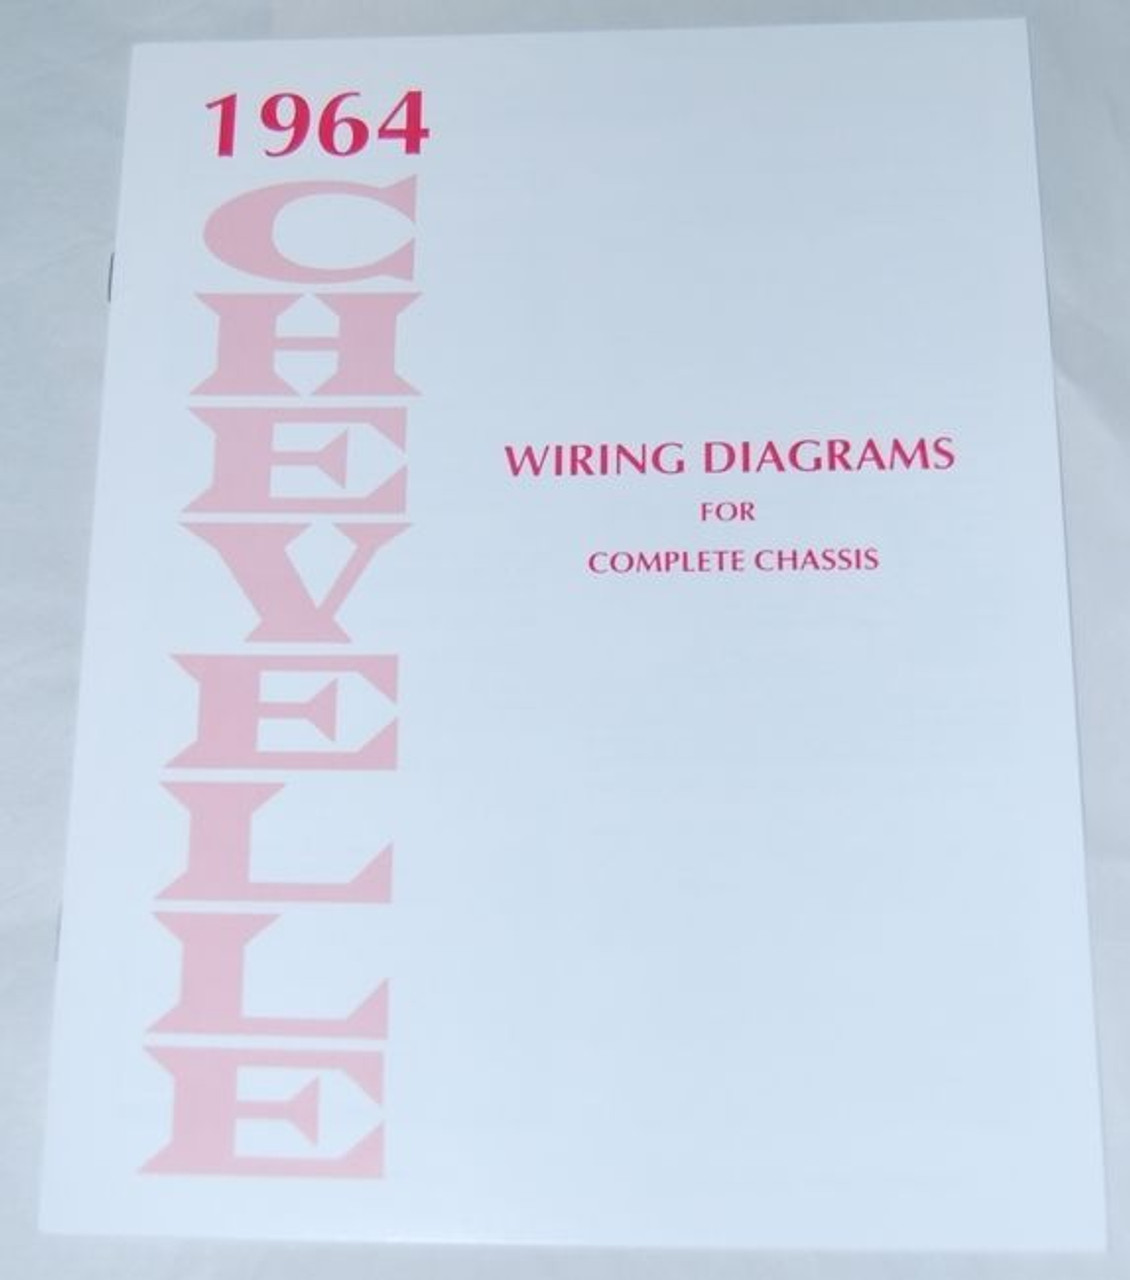 64 1964 Chevelle El Camino Electrical Wiring Diagram ...